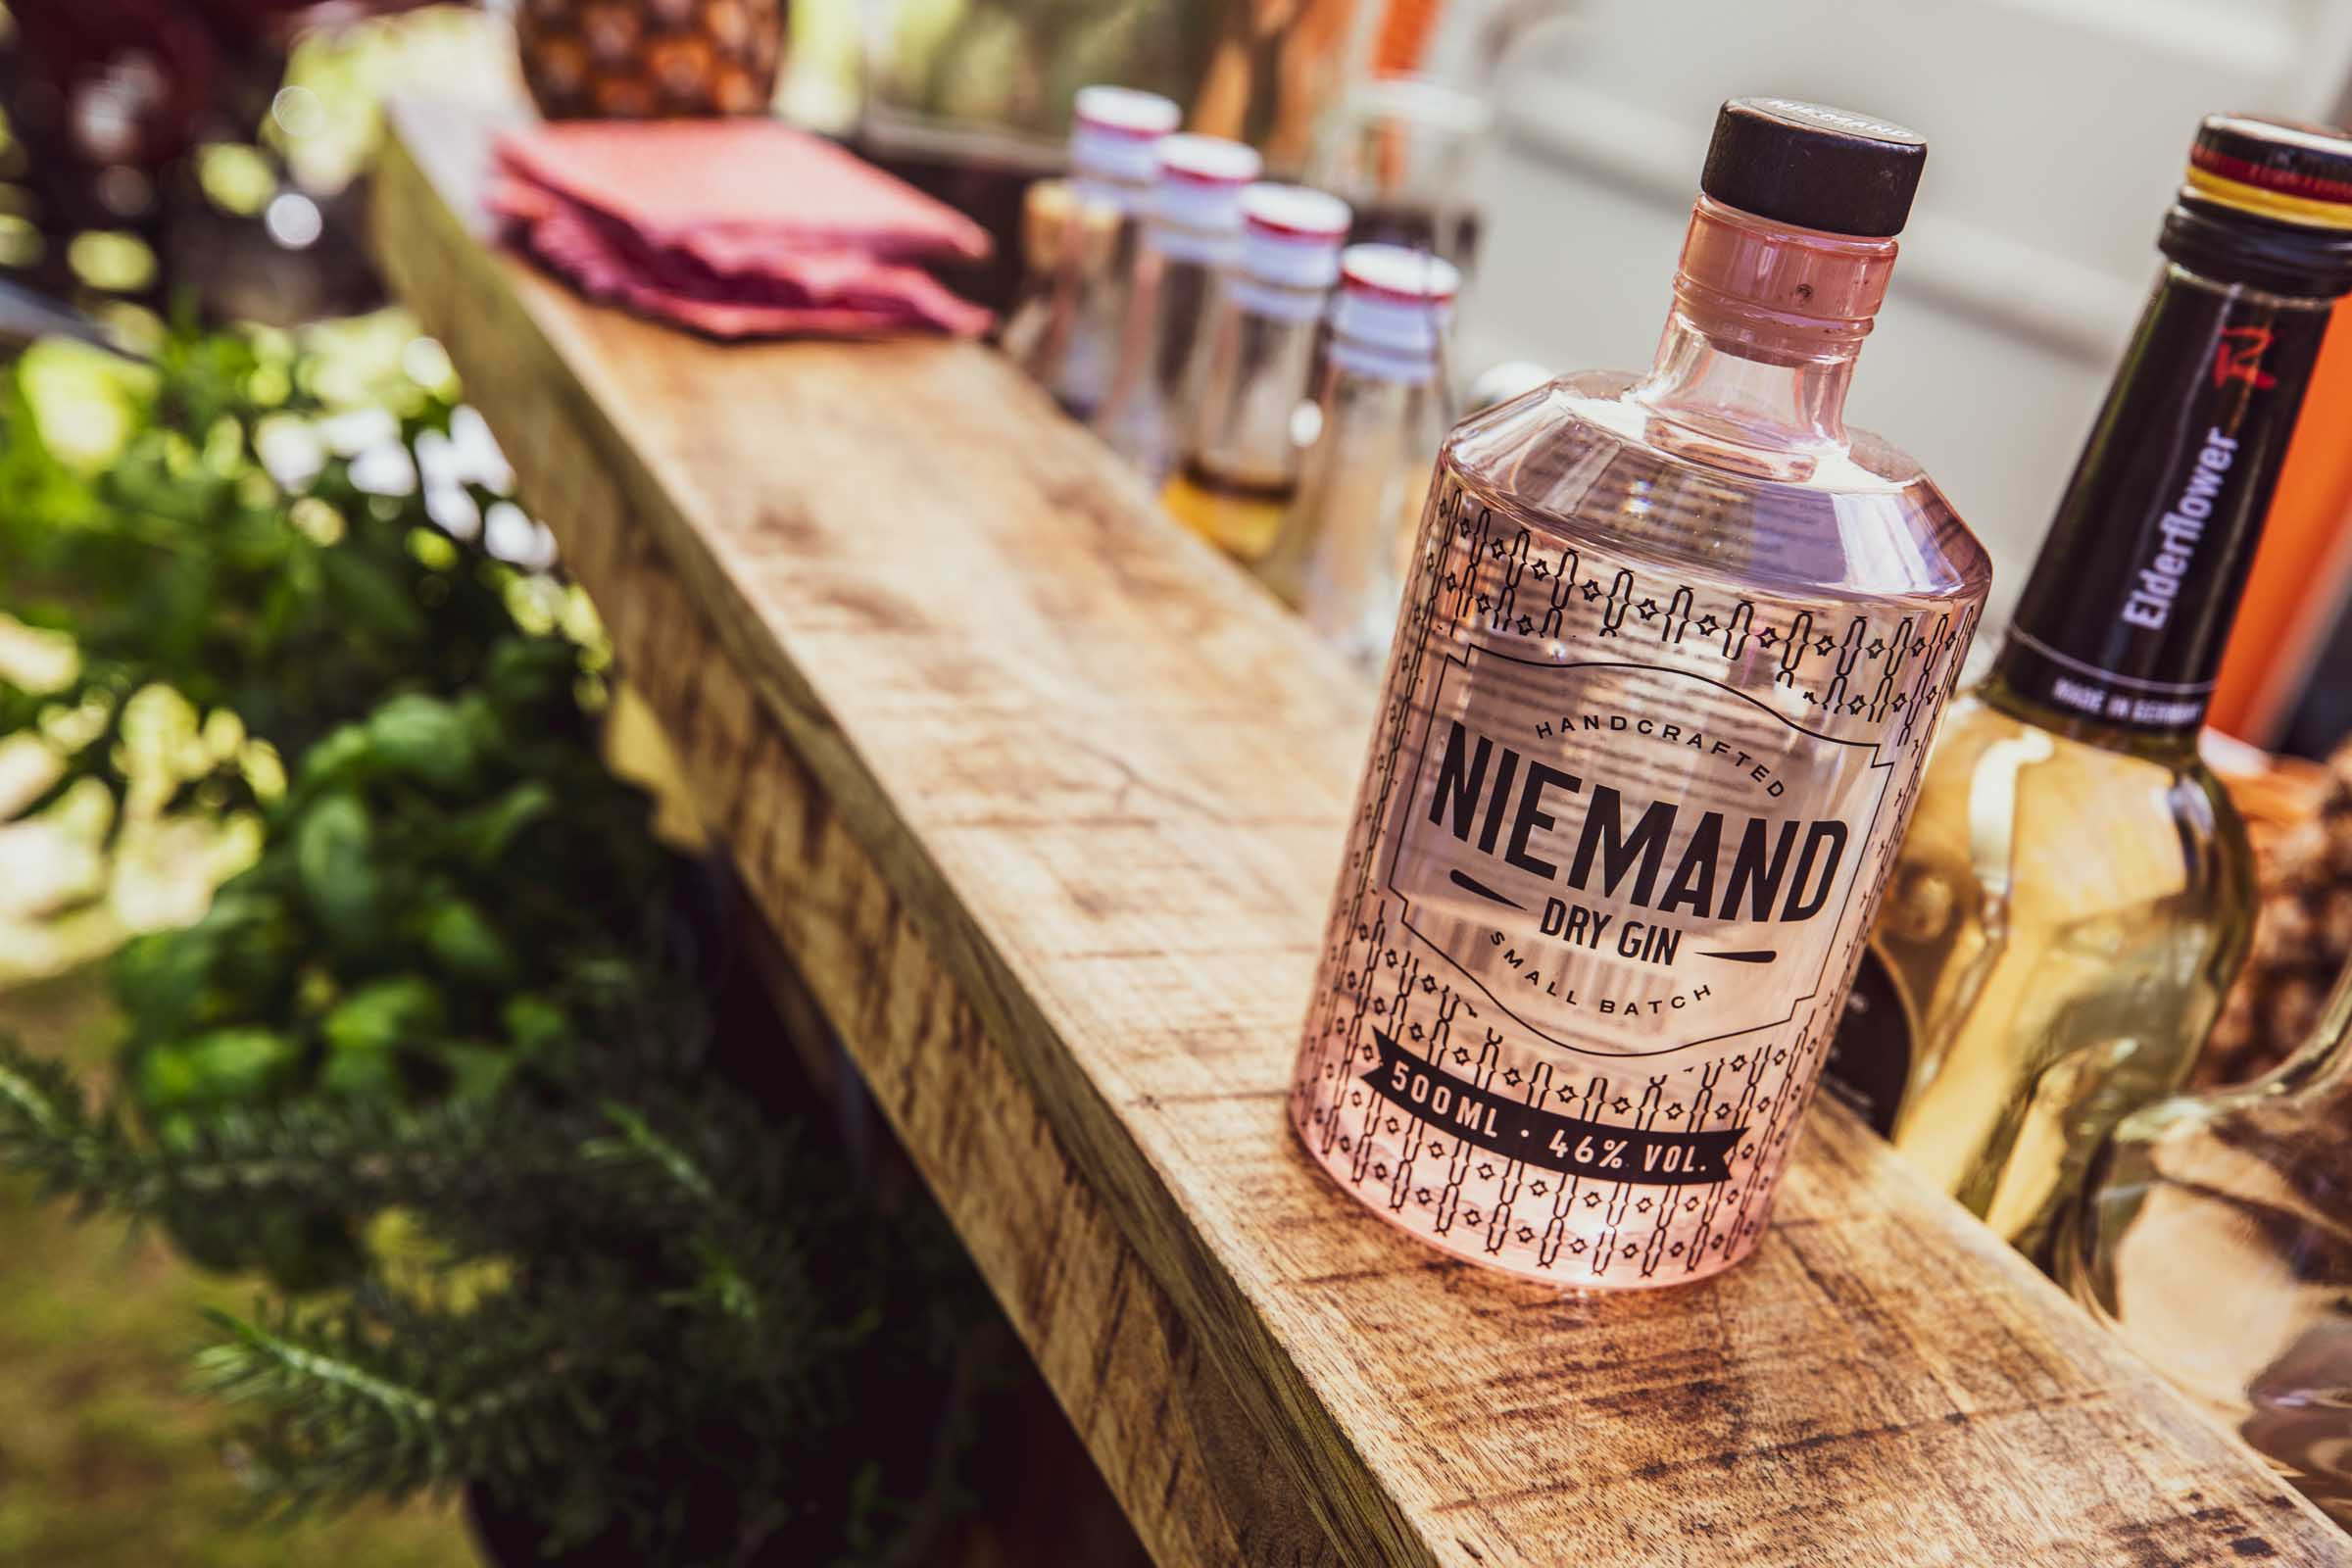 Barformat | Mobile | Bar | Cocktailservice | Hannover | Getränke | Catering | Cocktails | Wein | Aperitif | Niemand | Gin | Hochzeit | Messe |Firmenfeier | Buchen | Mieten | Anfragen